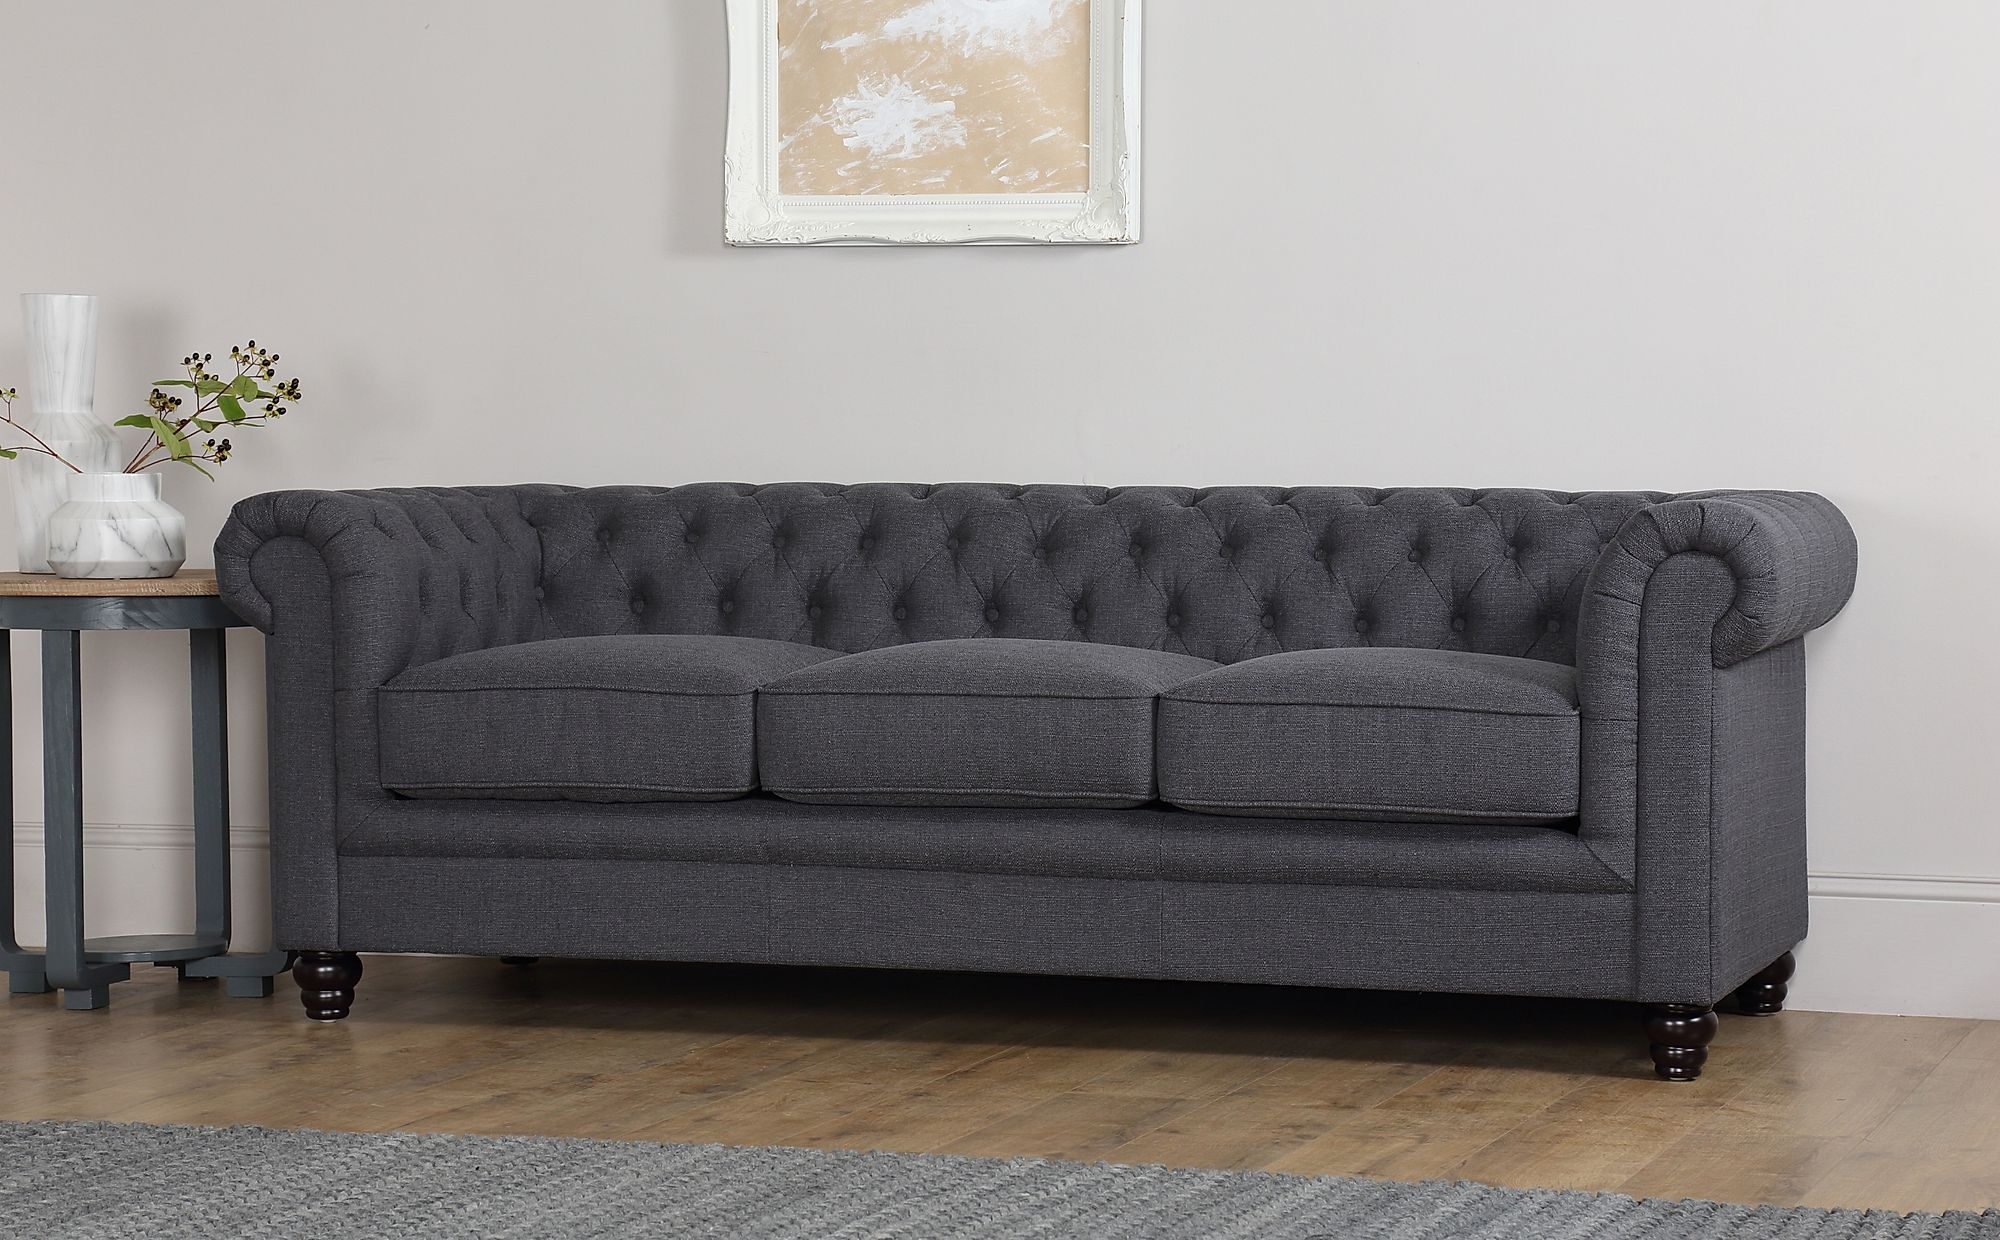 Hampton Slate Grey Fabric 3 Seater Chesterfield Sofa